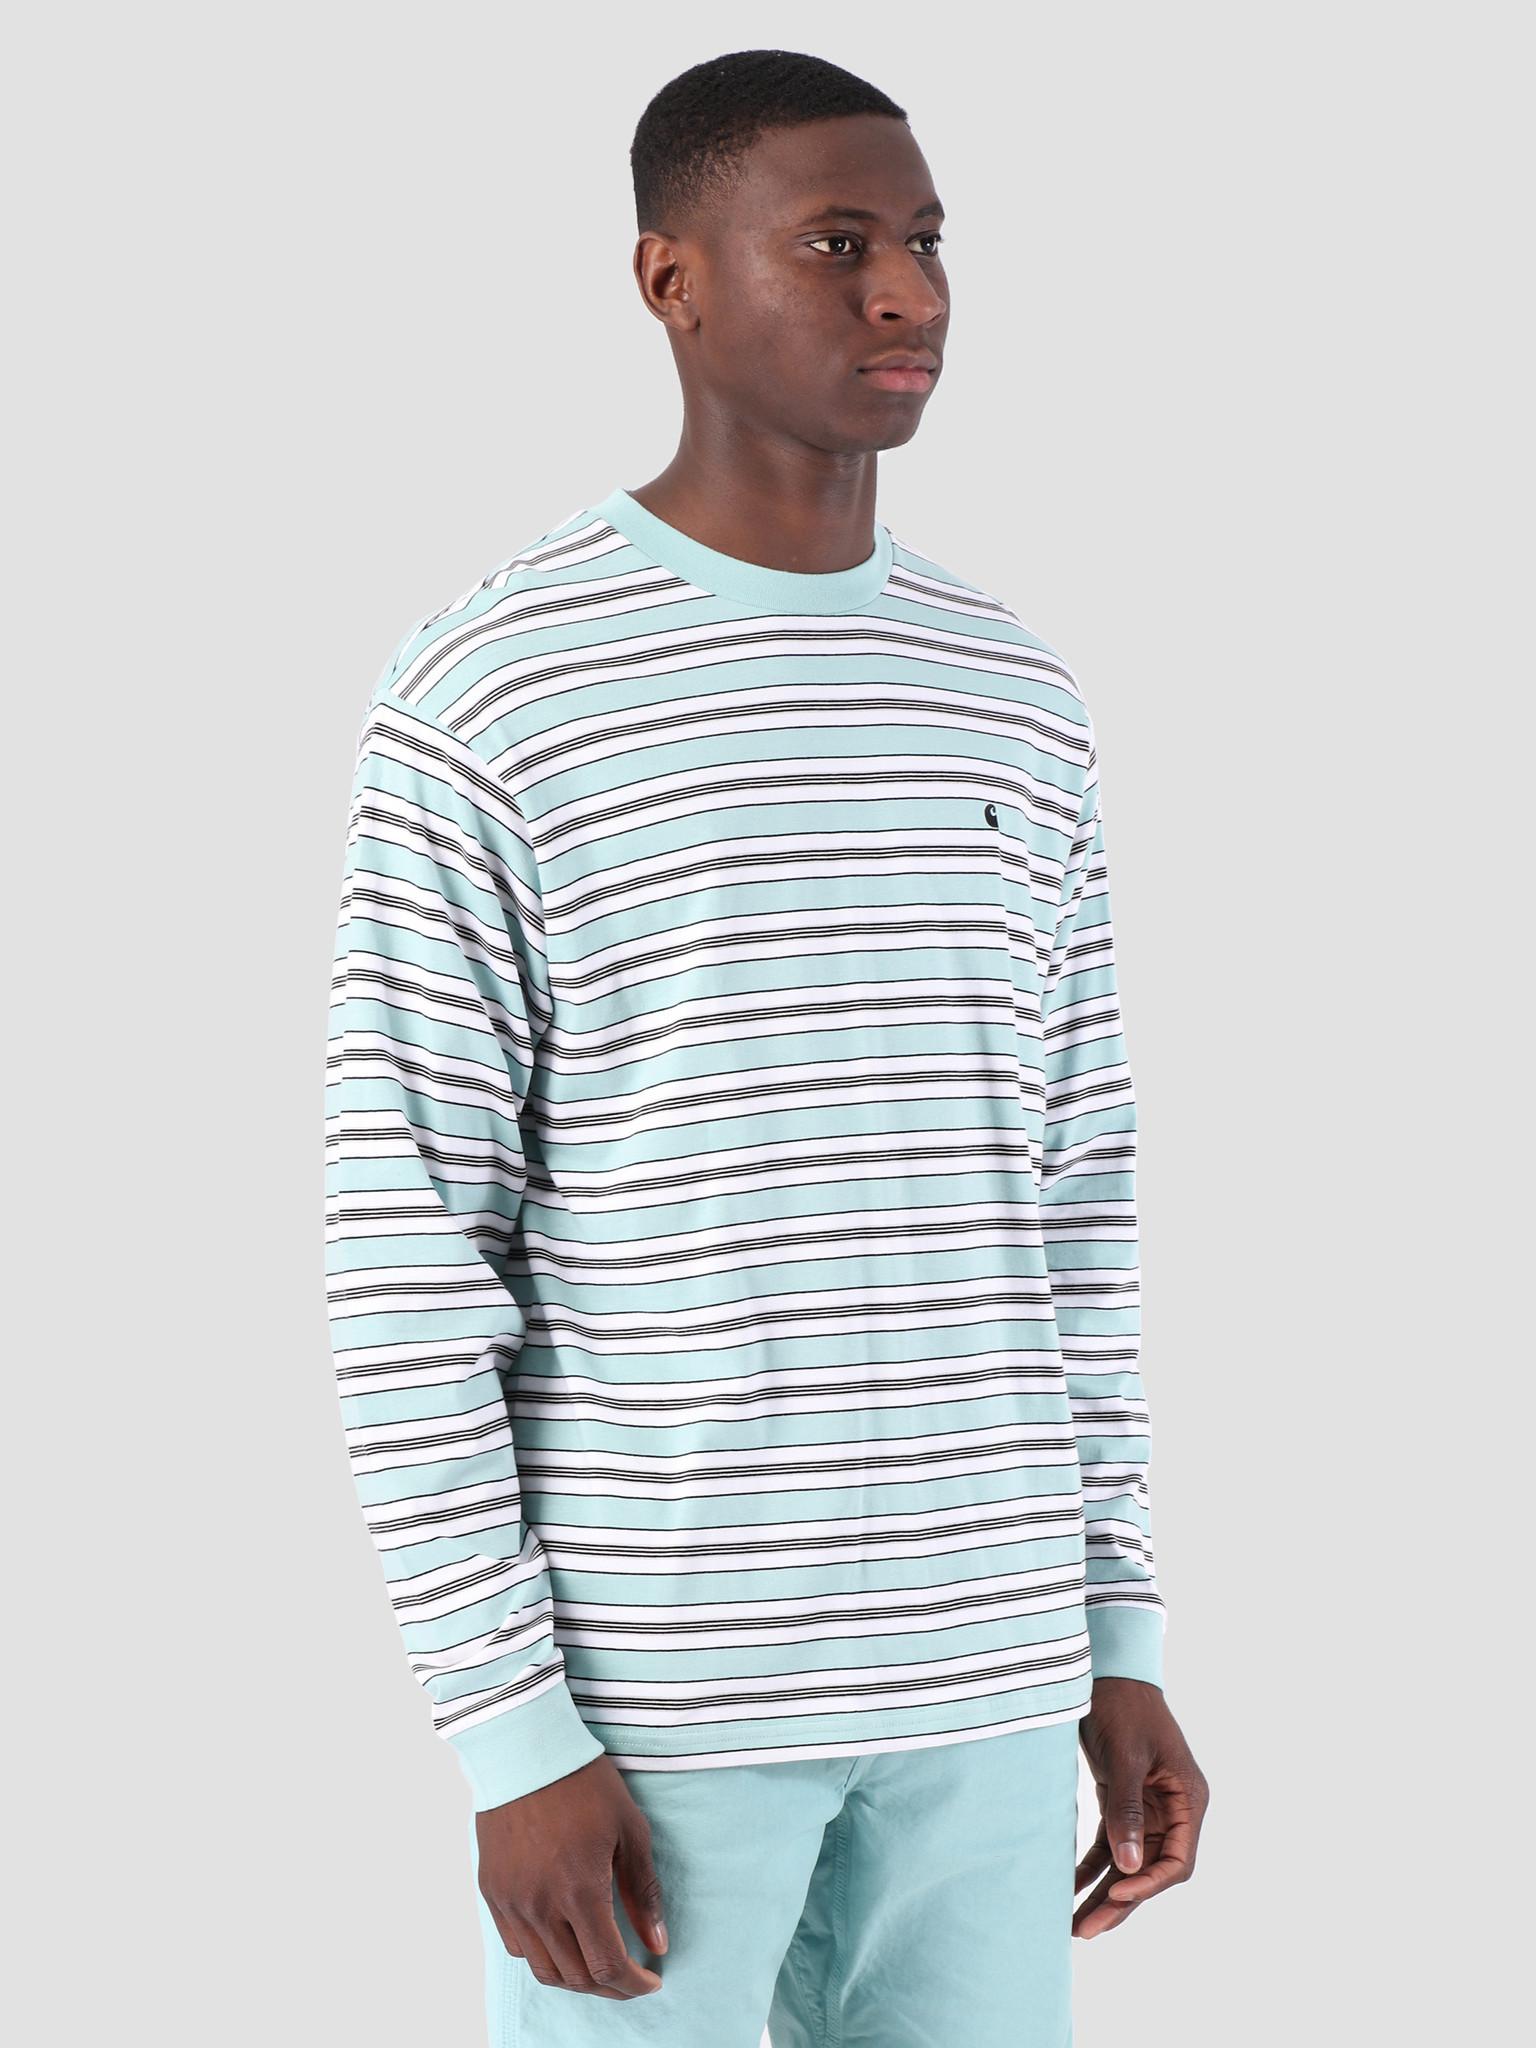 Carhartt WIP Carhartt WIP Long Sleeve Huron Shirt Huron Stripe Soft Aloe Black 61091000